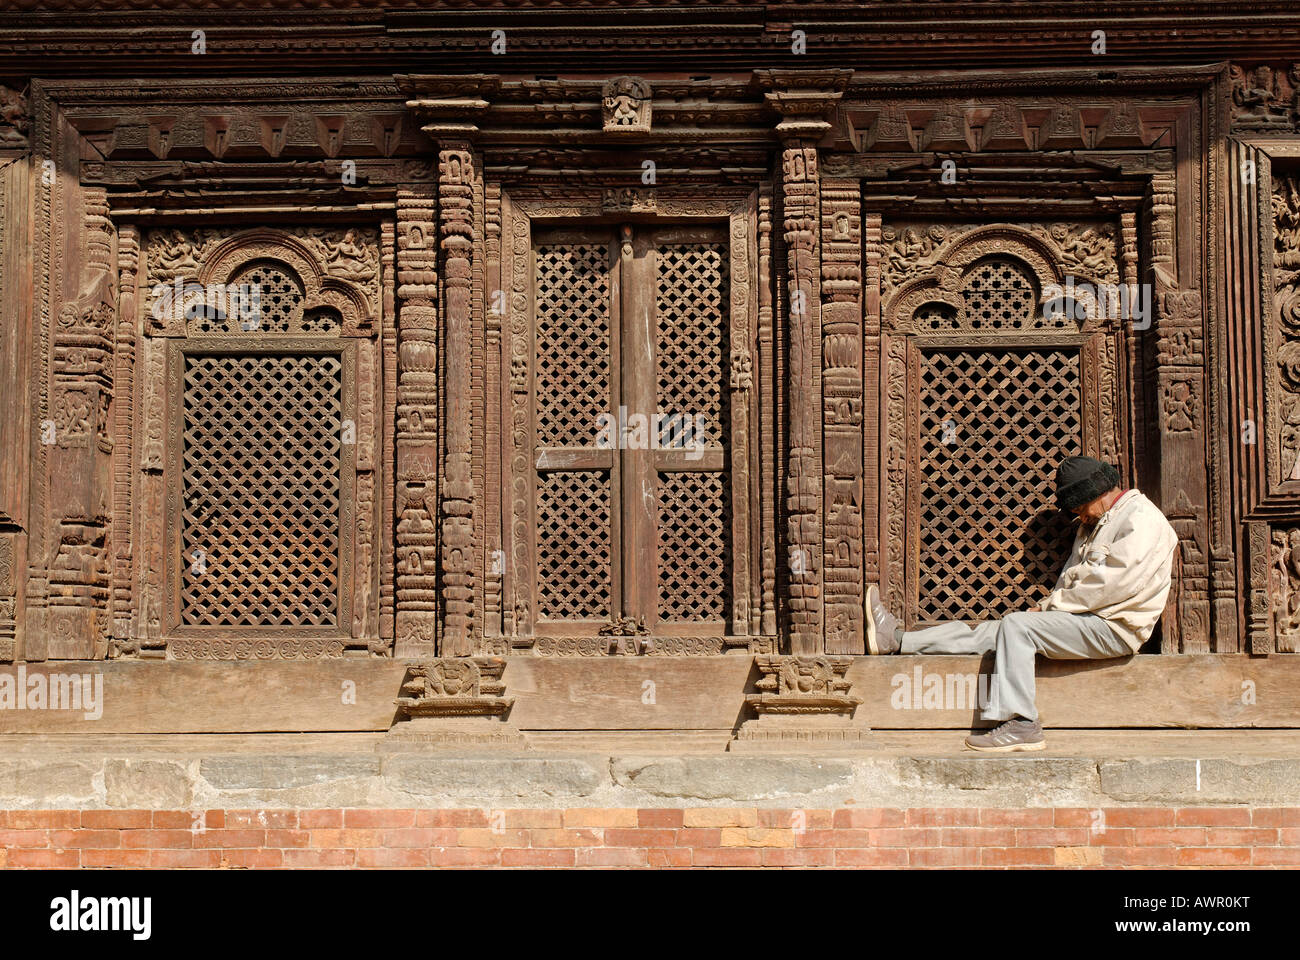 Man sleeping in front of a temple, Durbar Square of Patan, Lalitpur, Kathmandu, Nepal - Stock Image